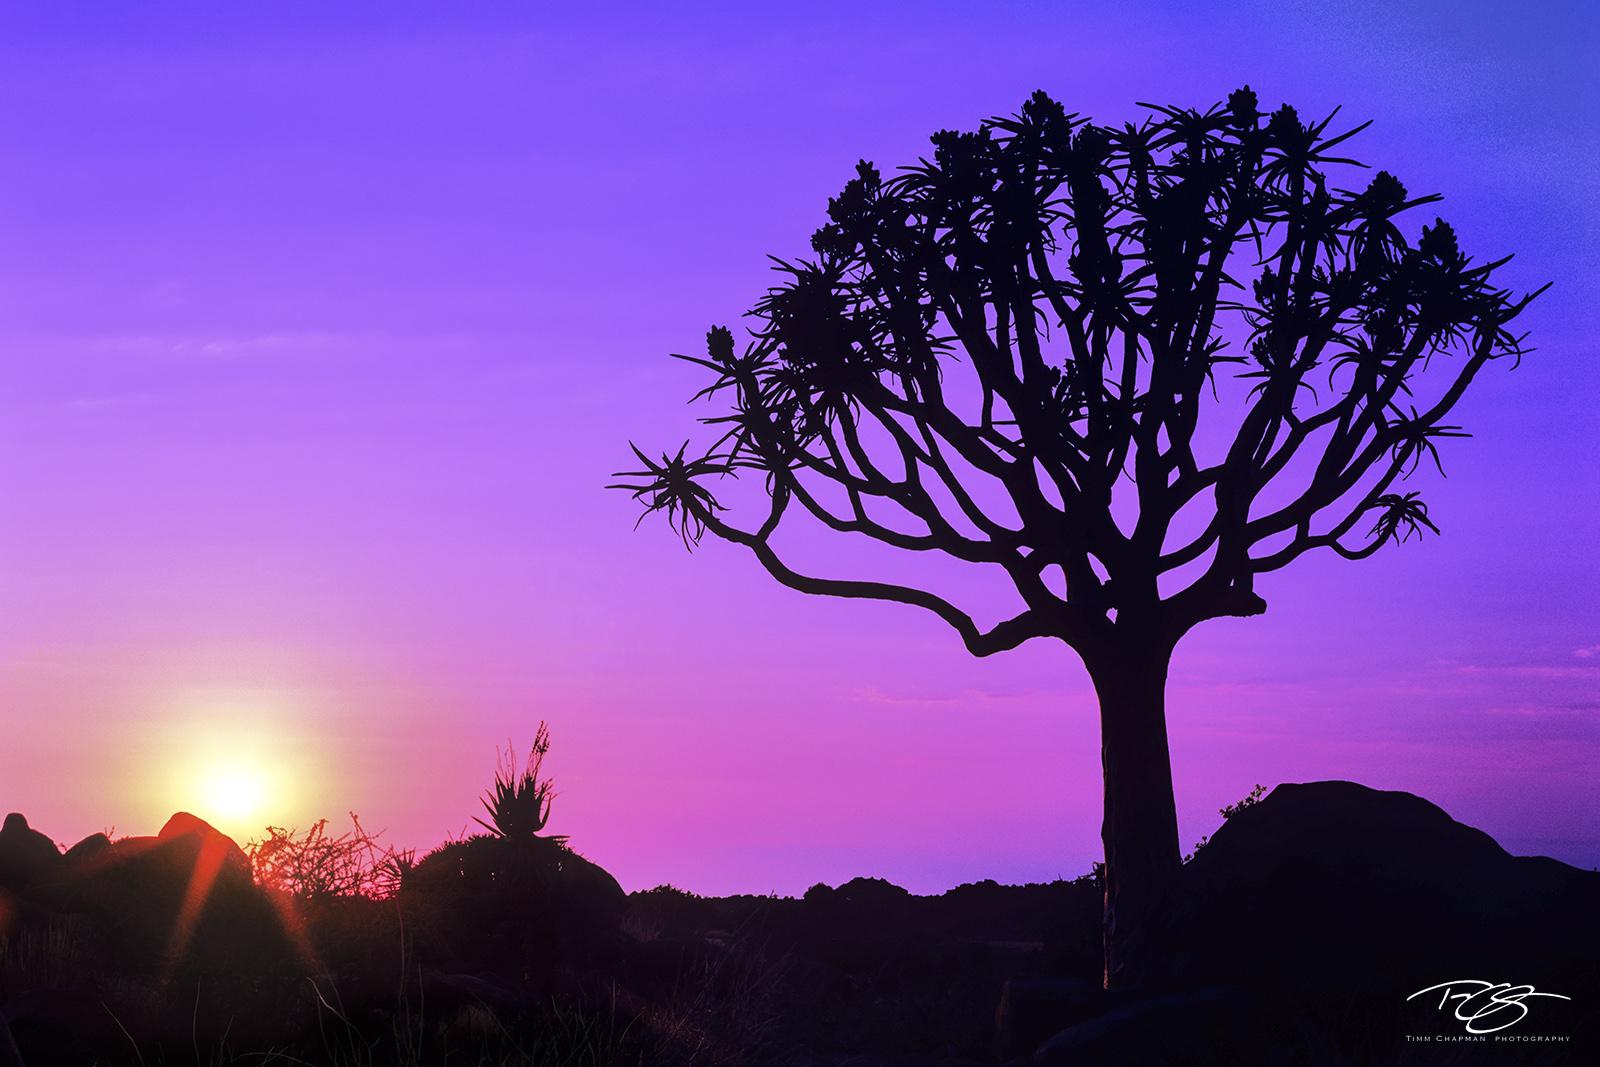 Namibia, kokerboom tree, kokerboom, quiver tree, kalahari desert, namib desert, silhouette, desert, bushman land, sunset, kokerboom, tree of knowledge, purple, blue, sunset, photo